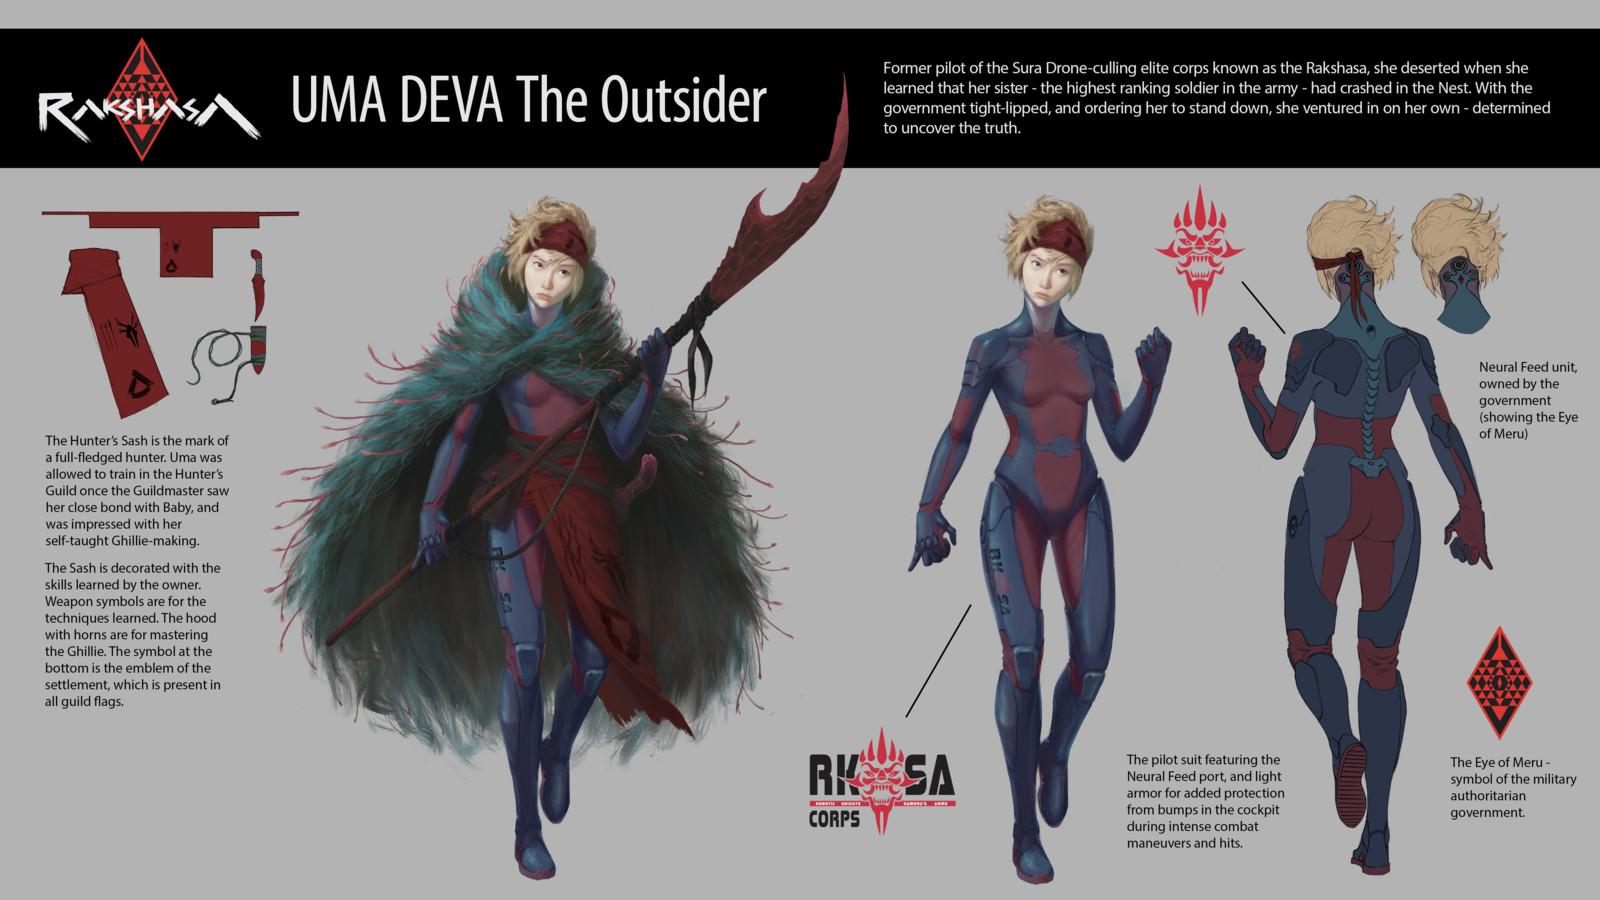 RAKSHASA: Uma Deva The Outsider + Guild Flags